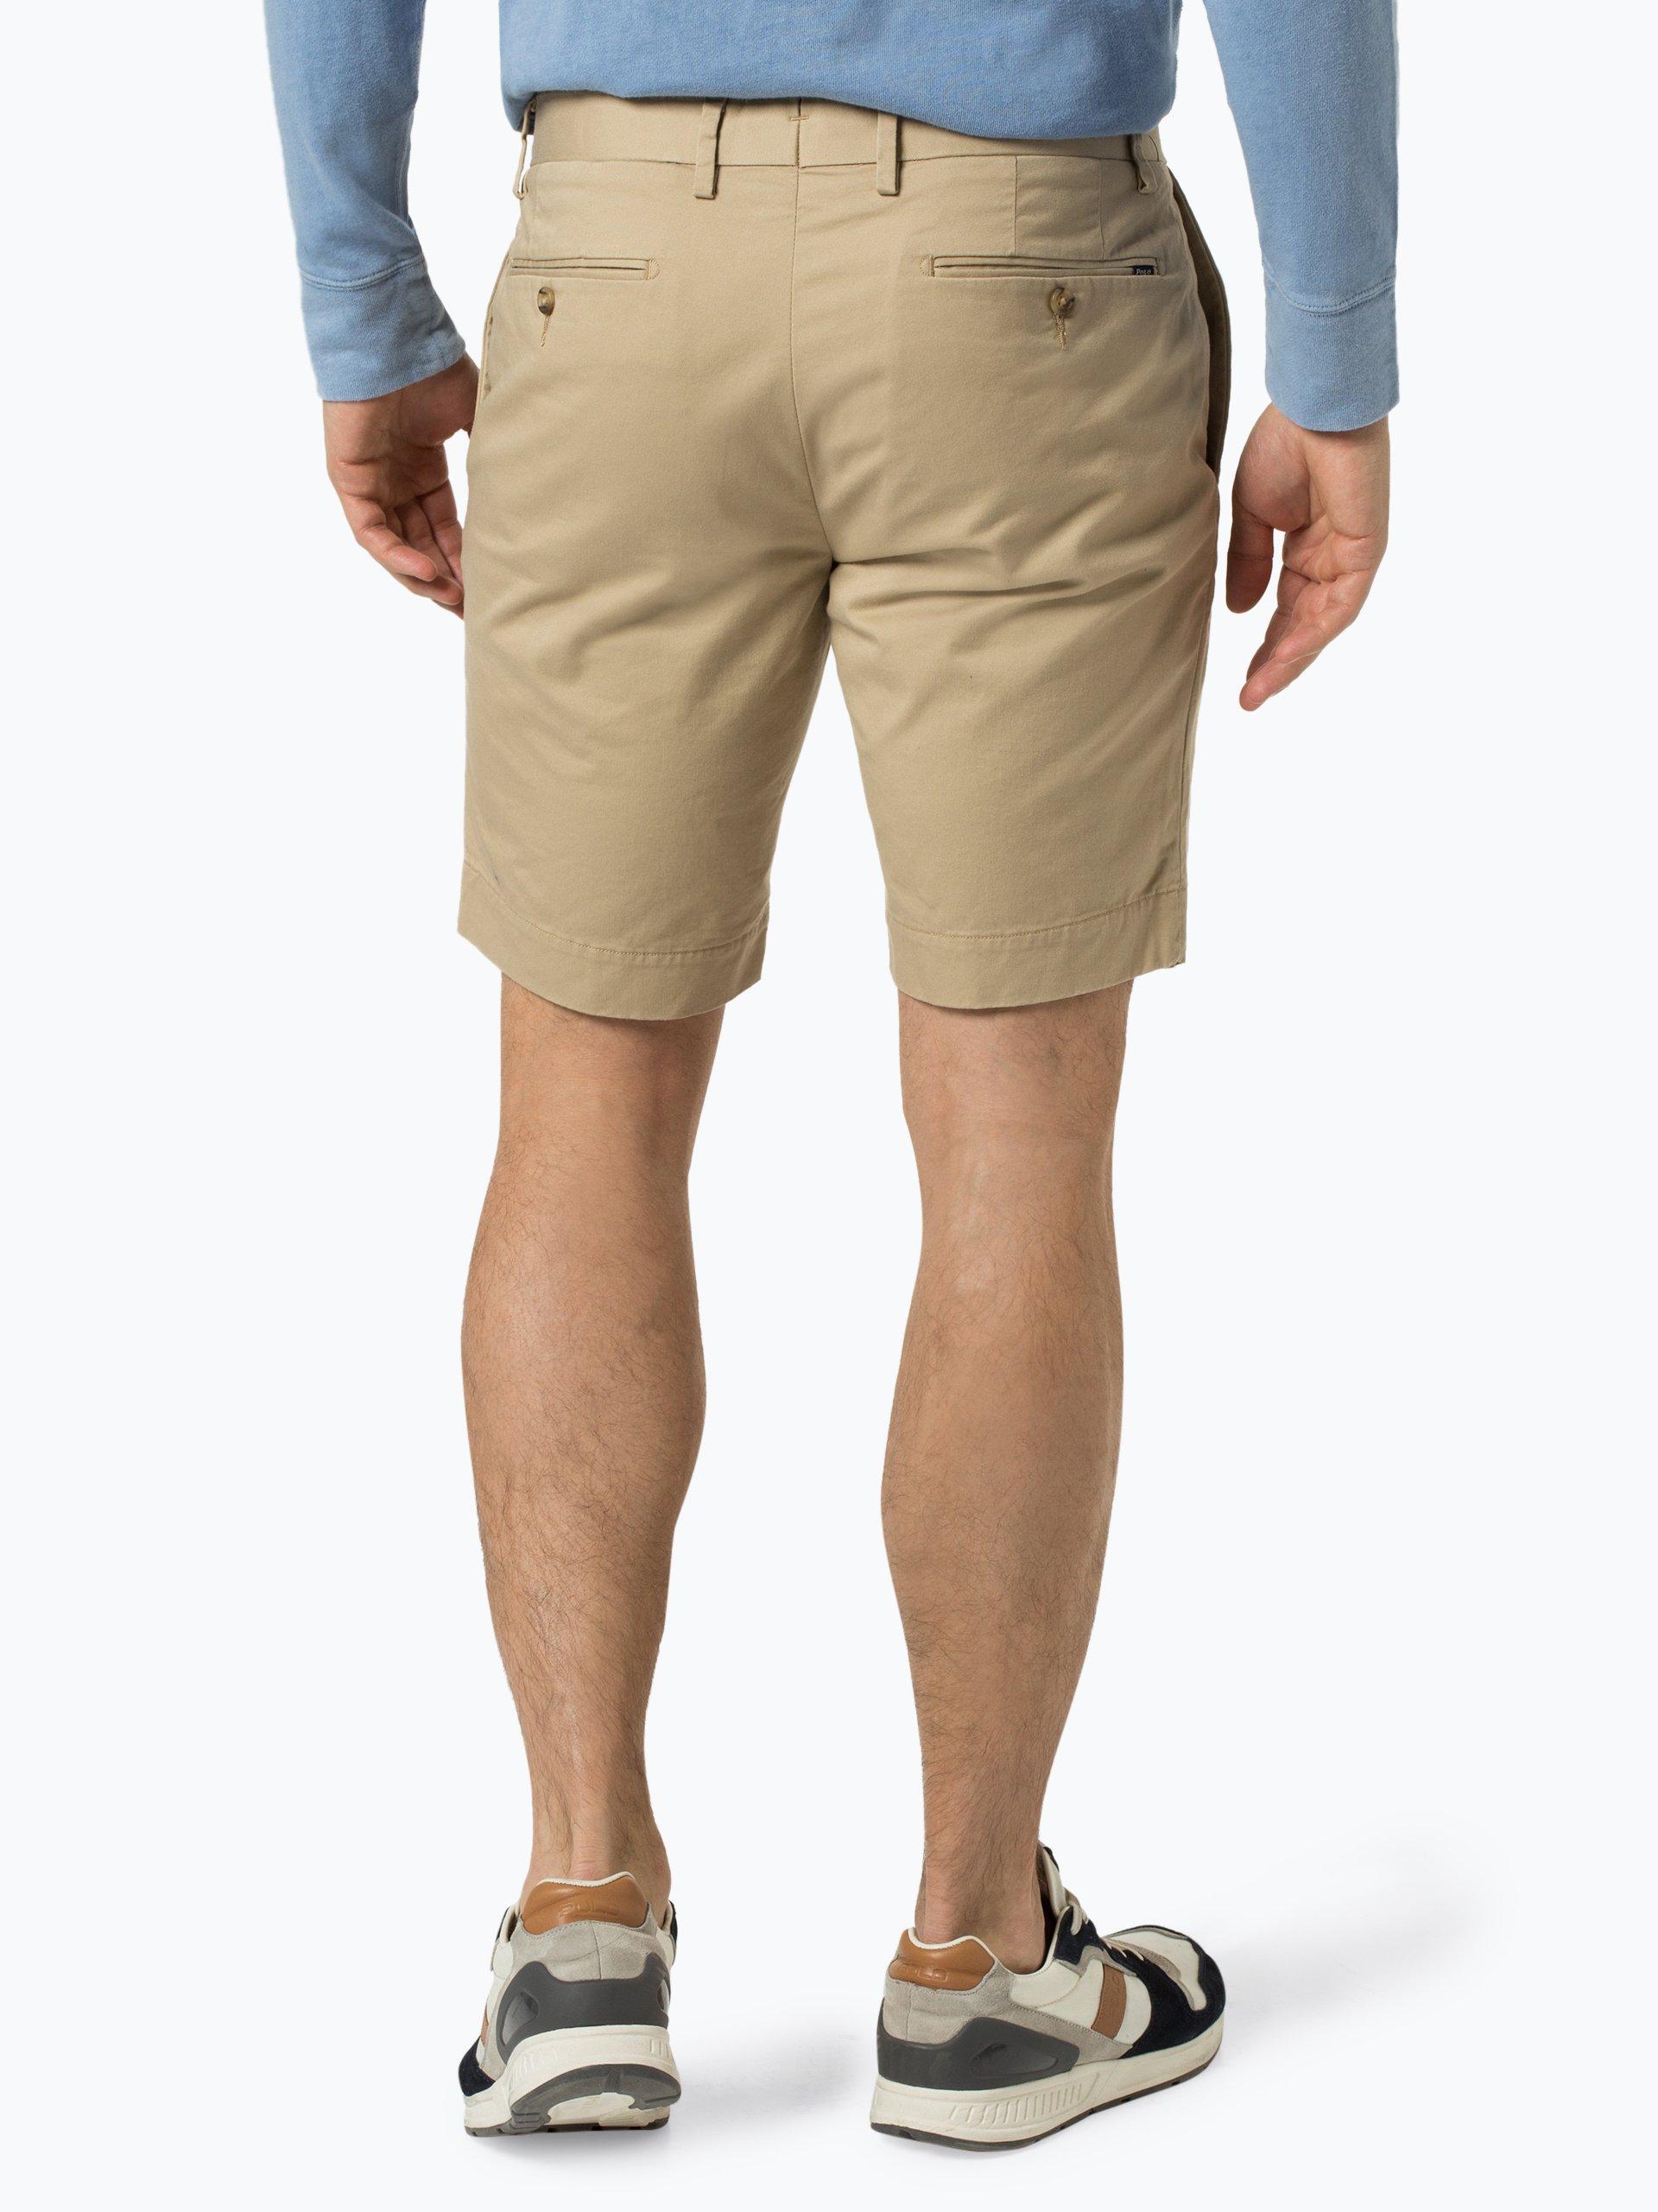 polo ralph lauren herren shorts slim fit online kaufen. Black Bedroom Furniture Sets. Home Design Ideas